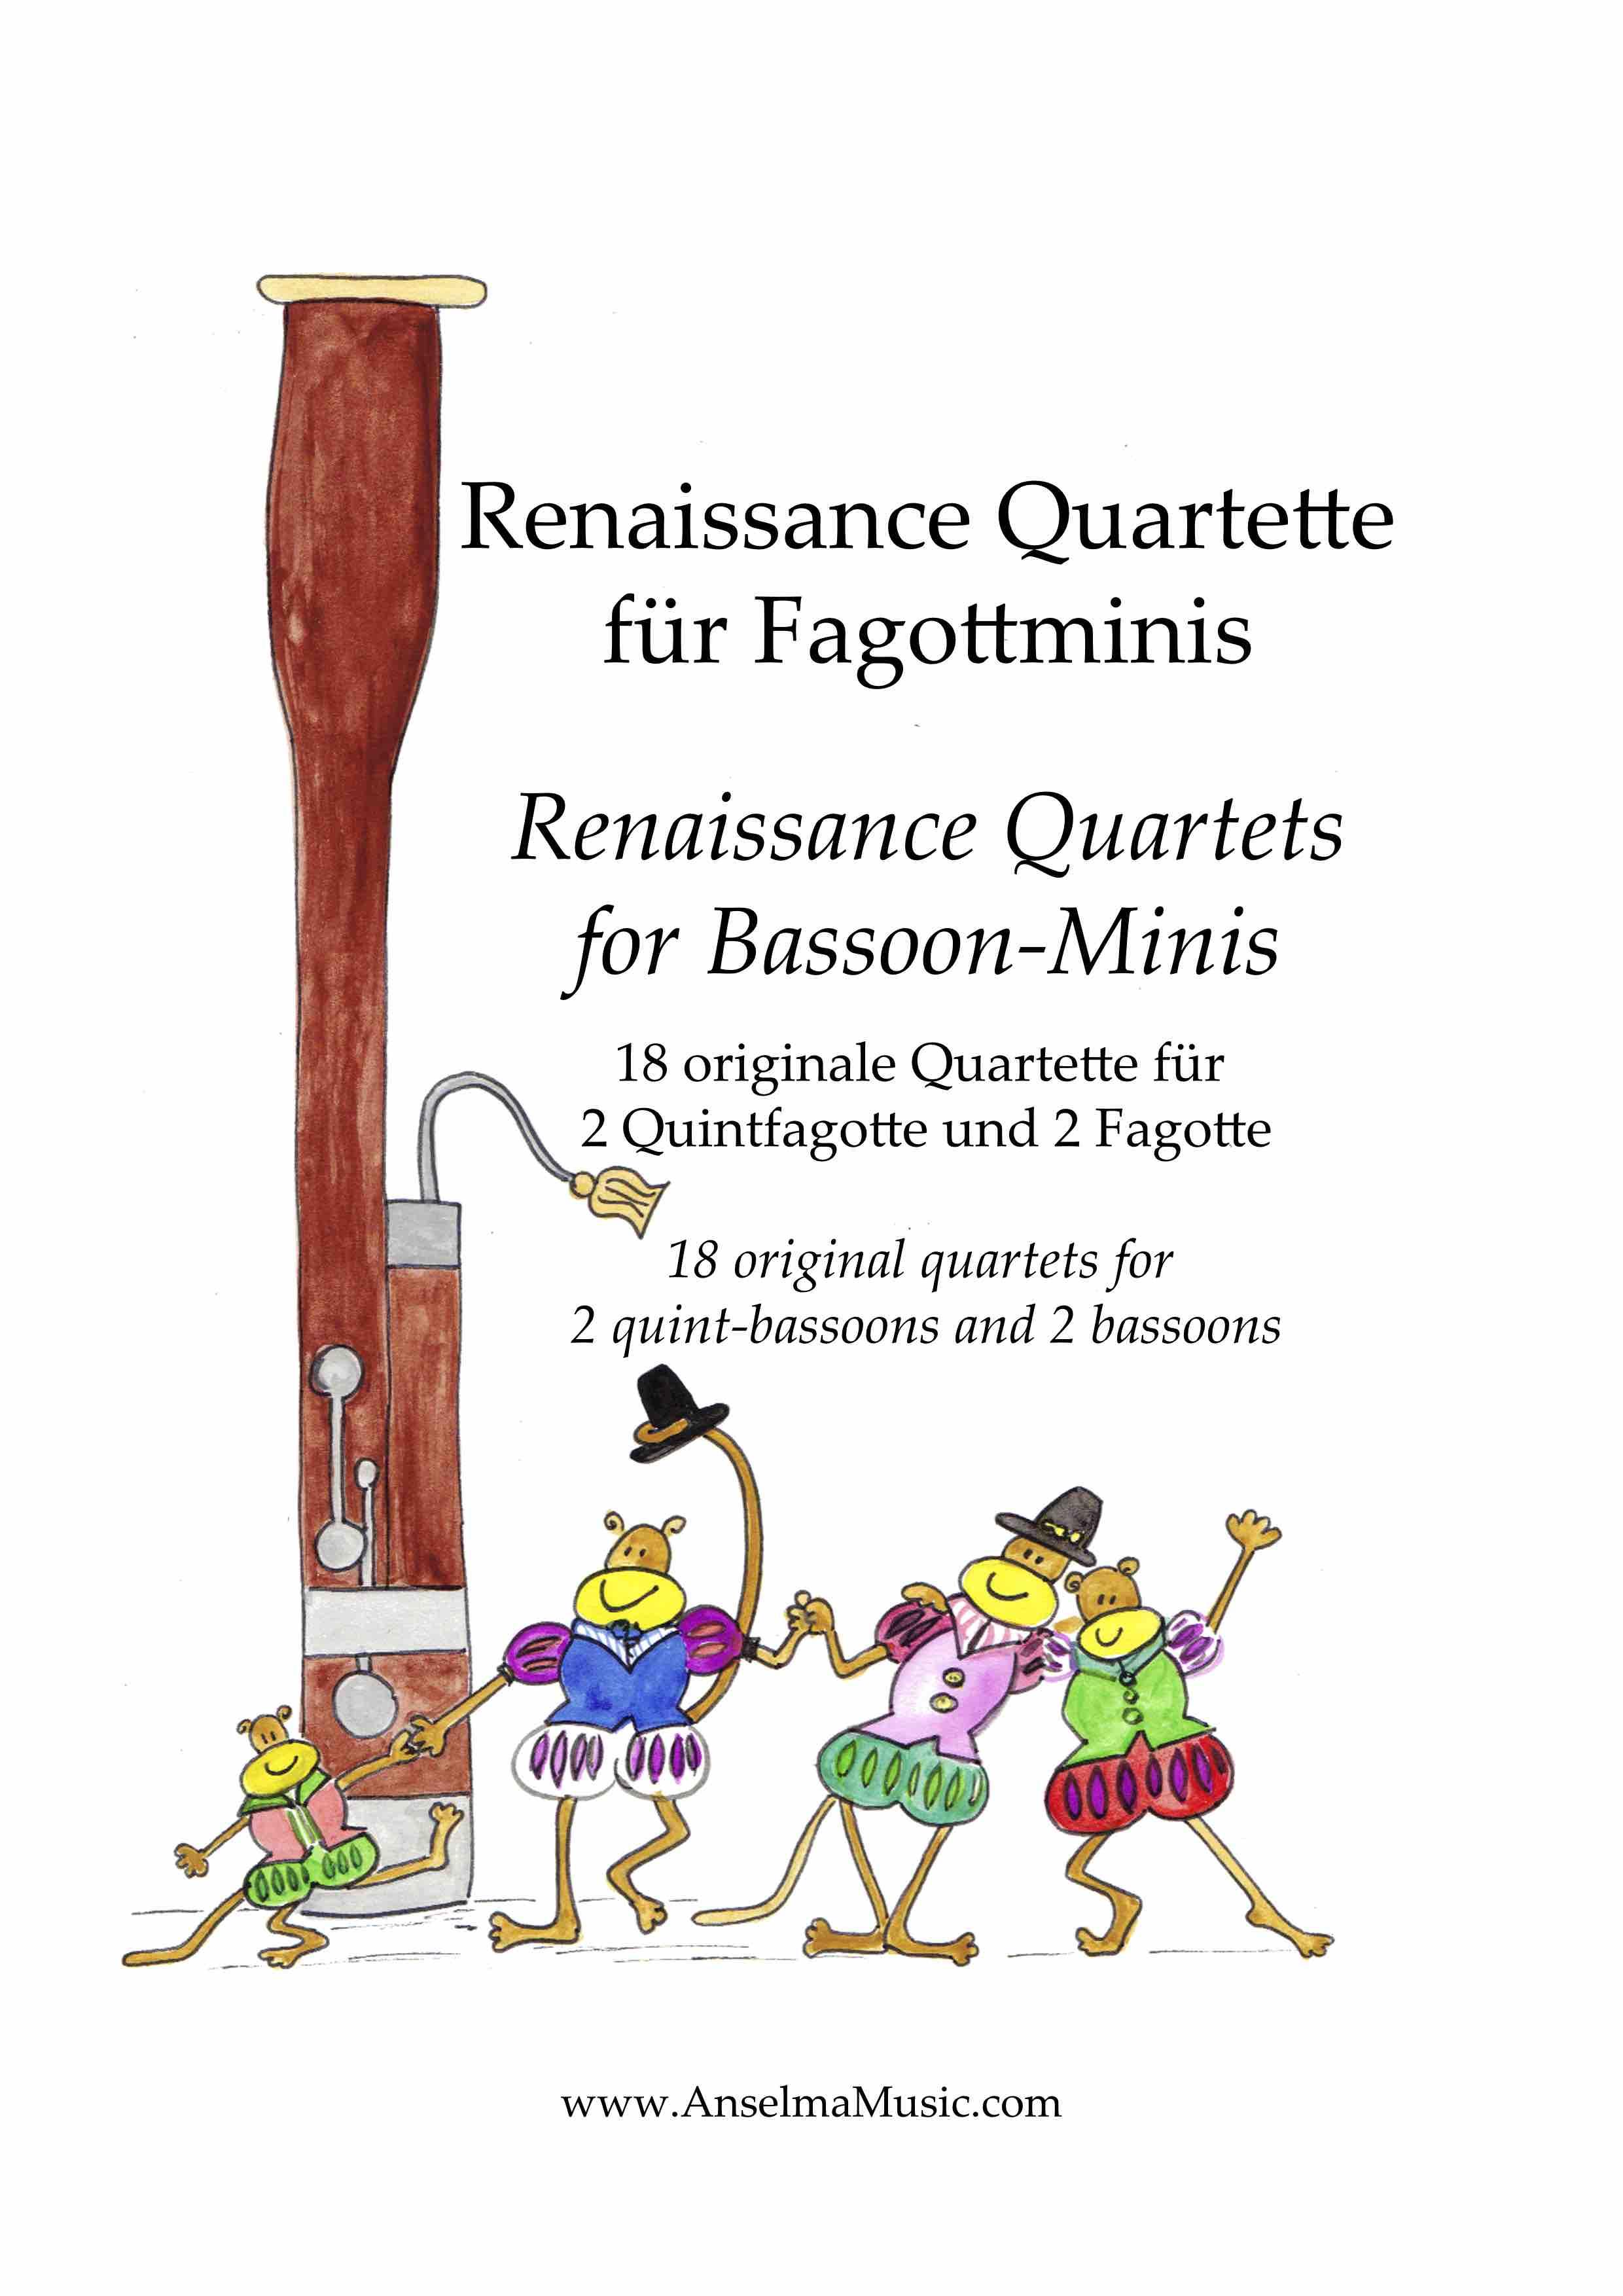 Renaissance Quartette fuer Fagottminis QUINT Fagott Quintfagott Anselma Veit